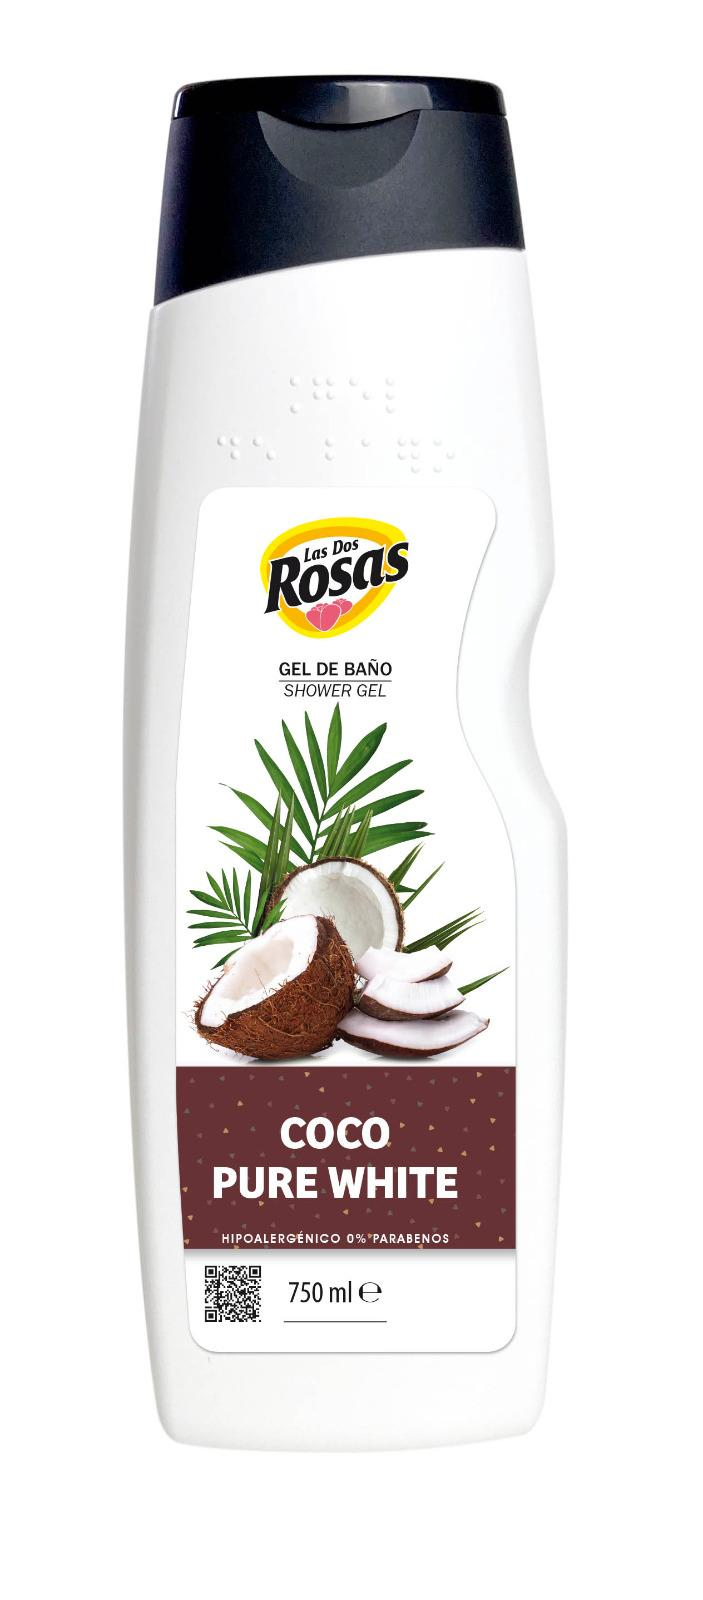 Las 2 Rosas Gel Ducha Coco Pure White 750ml